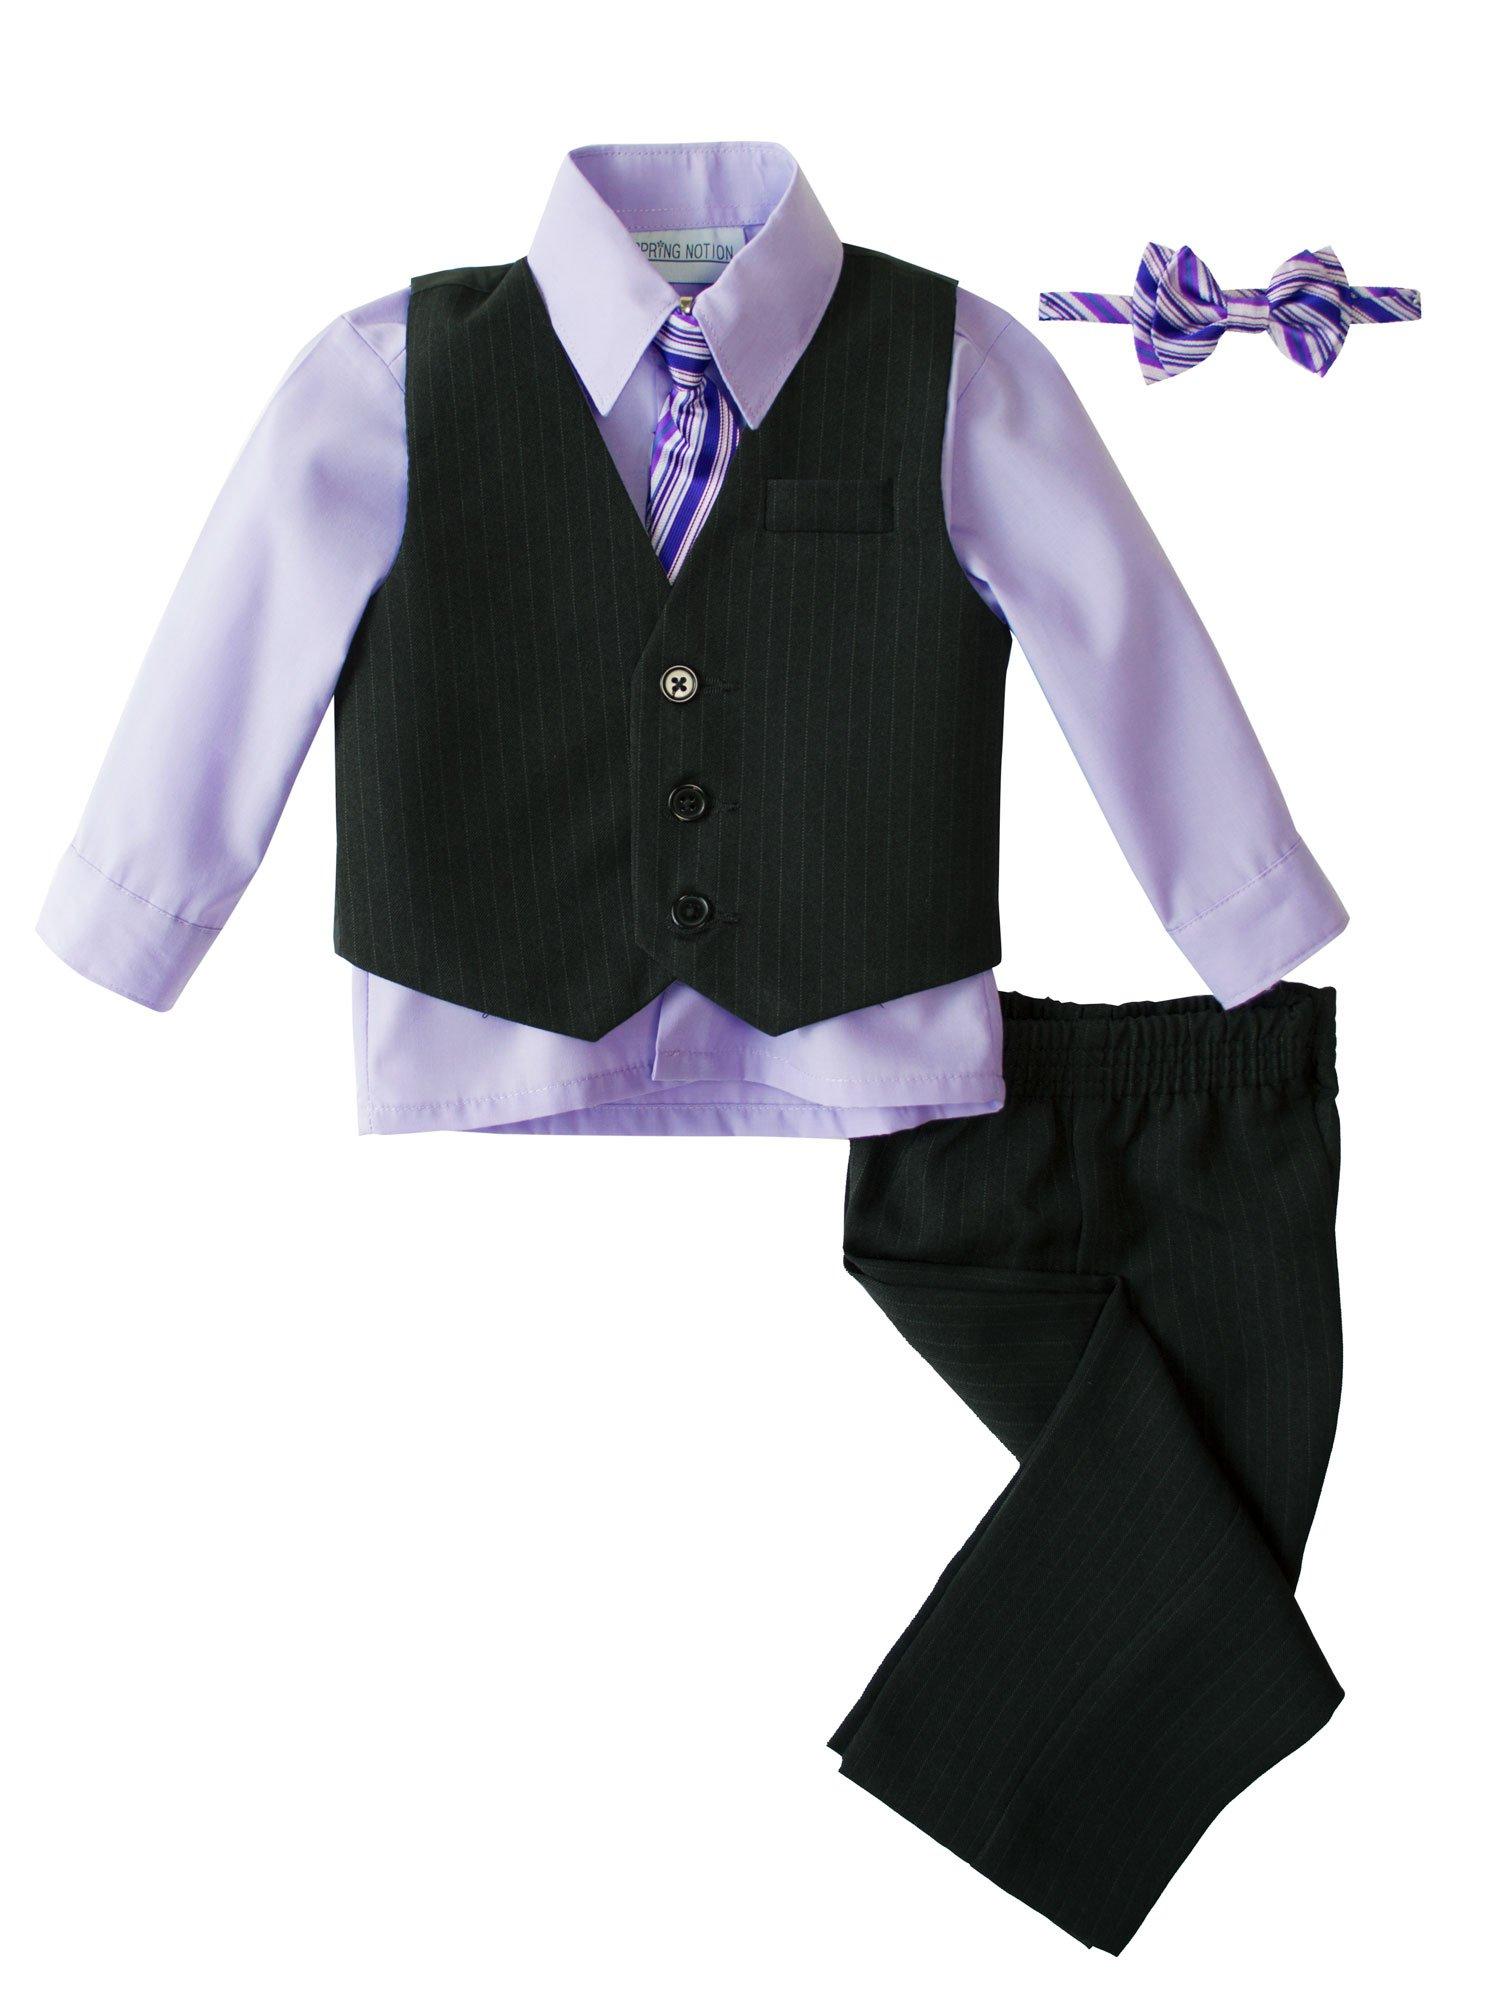 Spring Notion Toddler Boys Pinstripe Dress Shirt Vest & Pants Set 4T Lilac